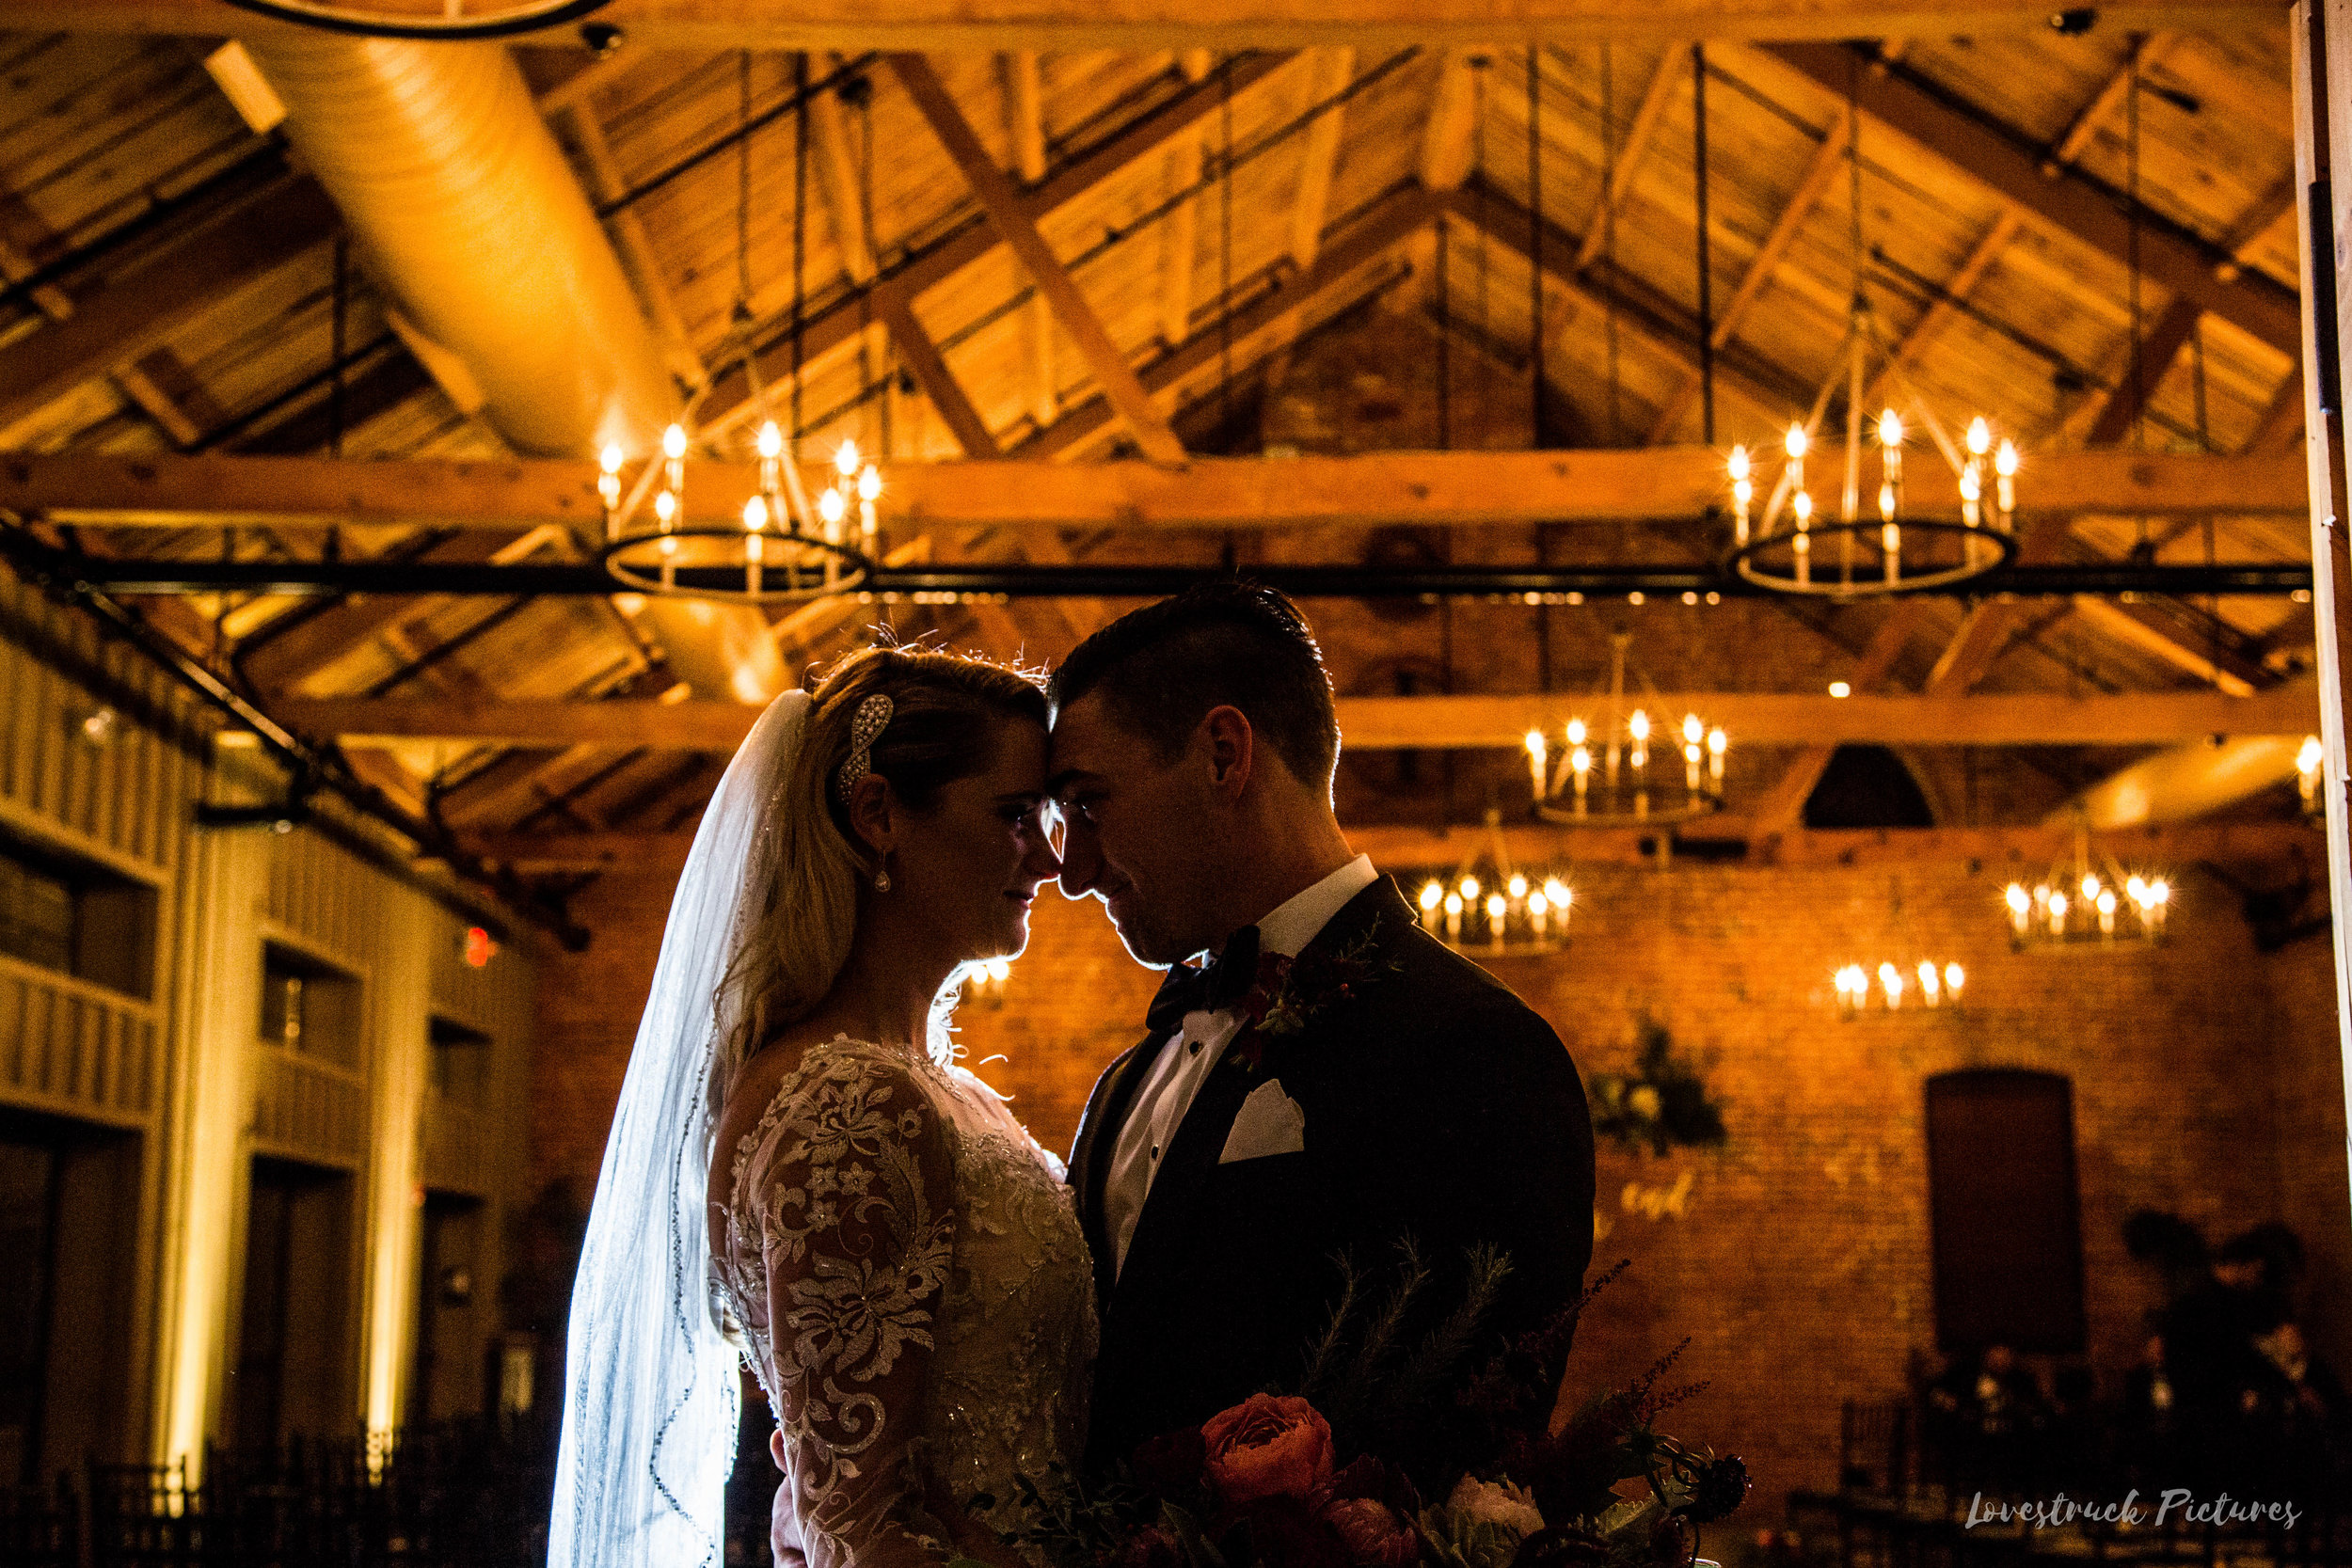 CORK_FACTORY_WEDDING_LANCASTER--268.jpg